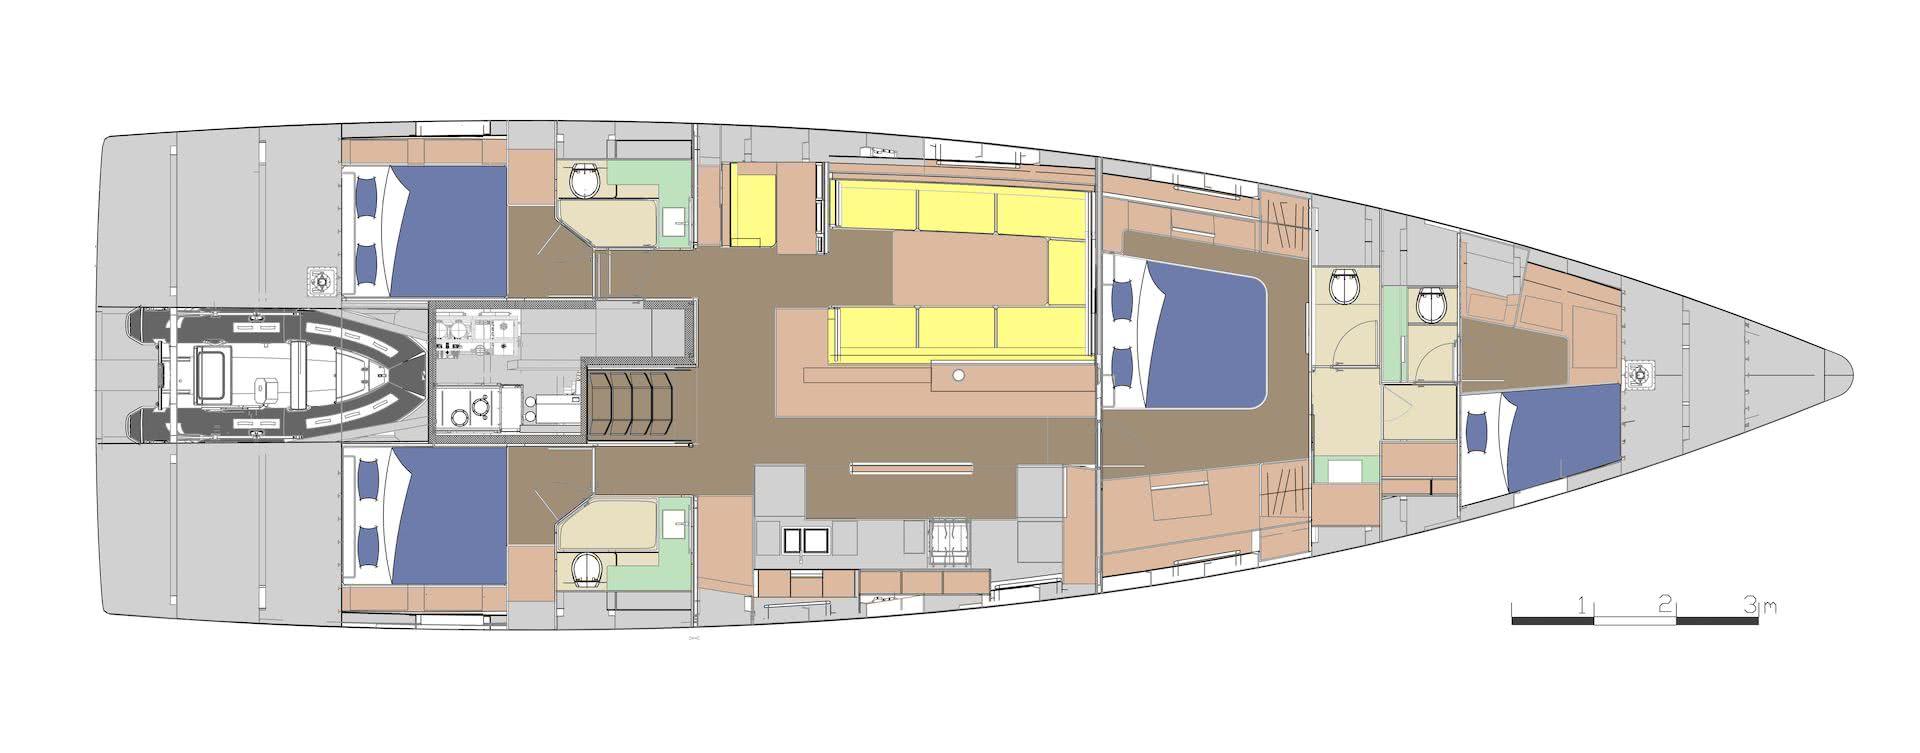 BASYC Yacht Layout